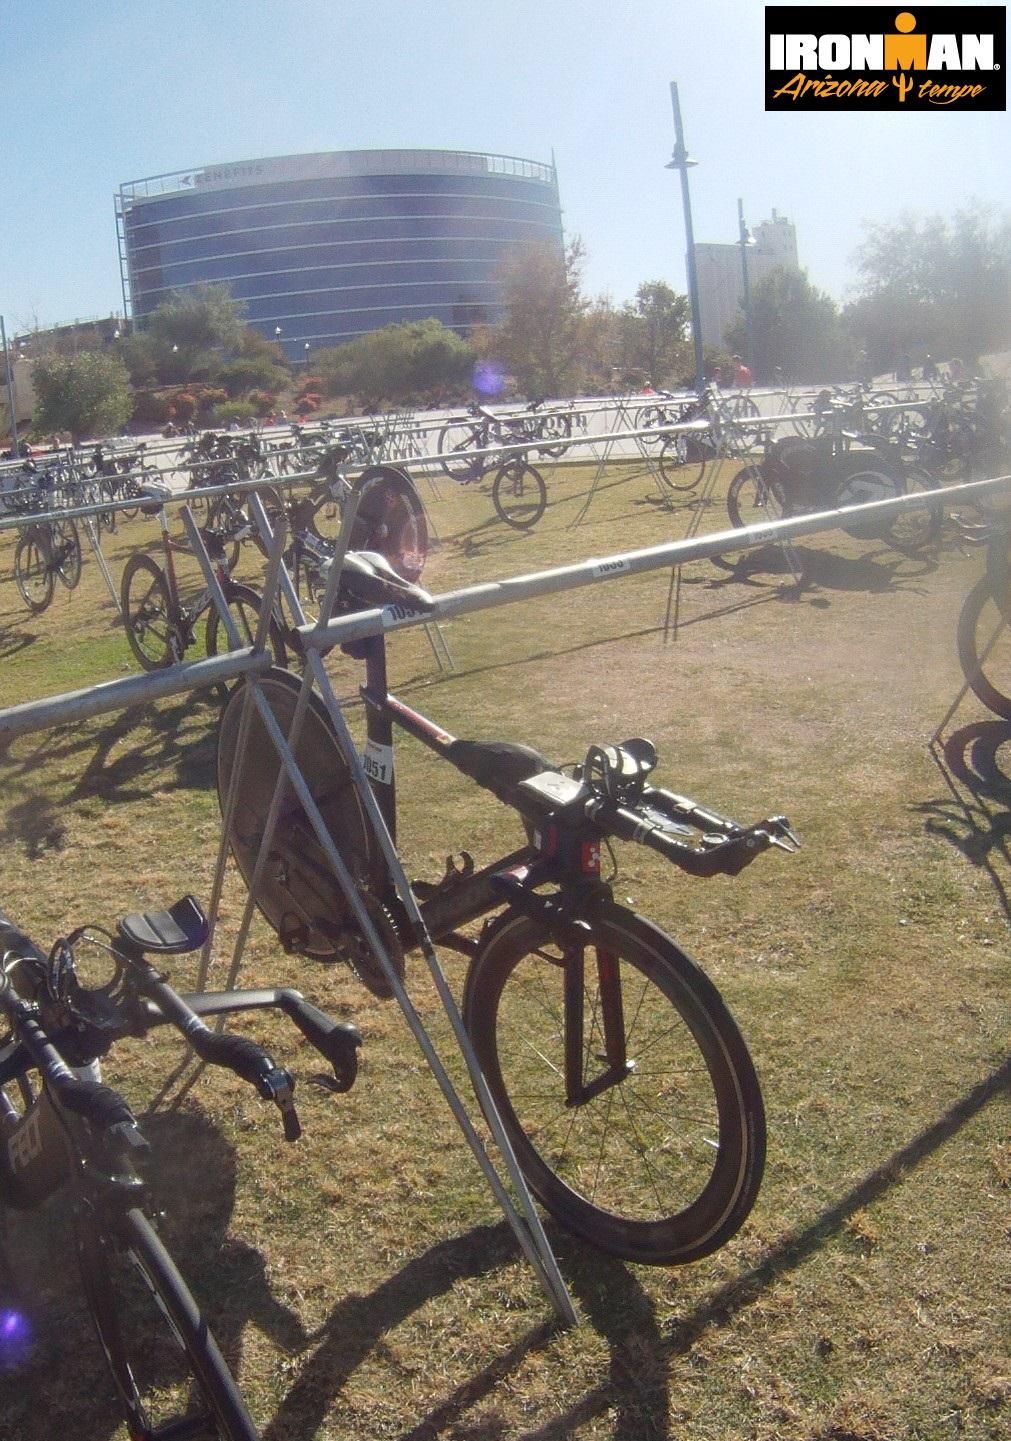 d8a3cf8ace8 1st AGer - Ironman Arizona Race Report  Triathlon Forum  Slowtwitch ...